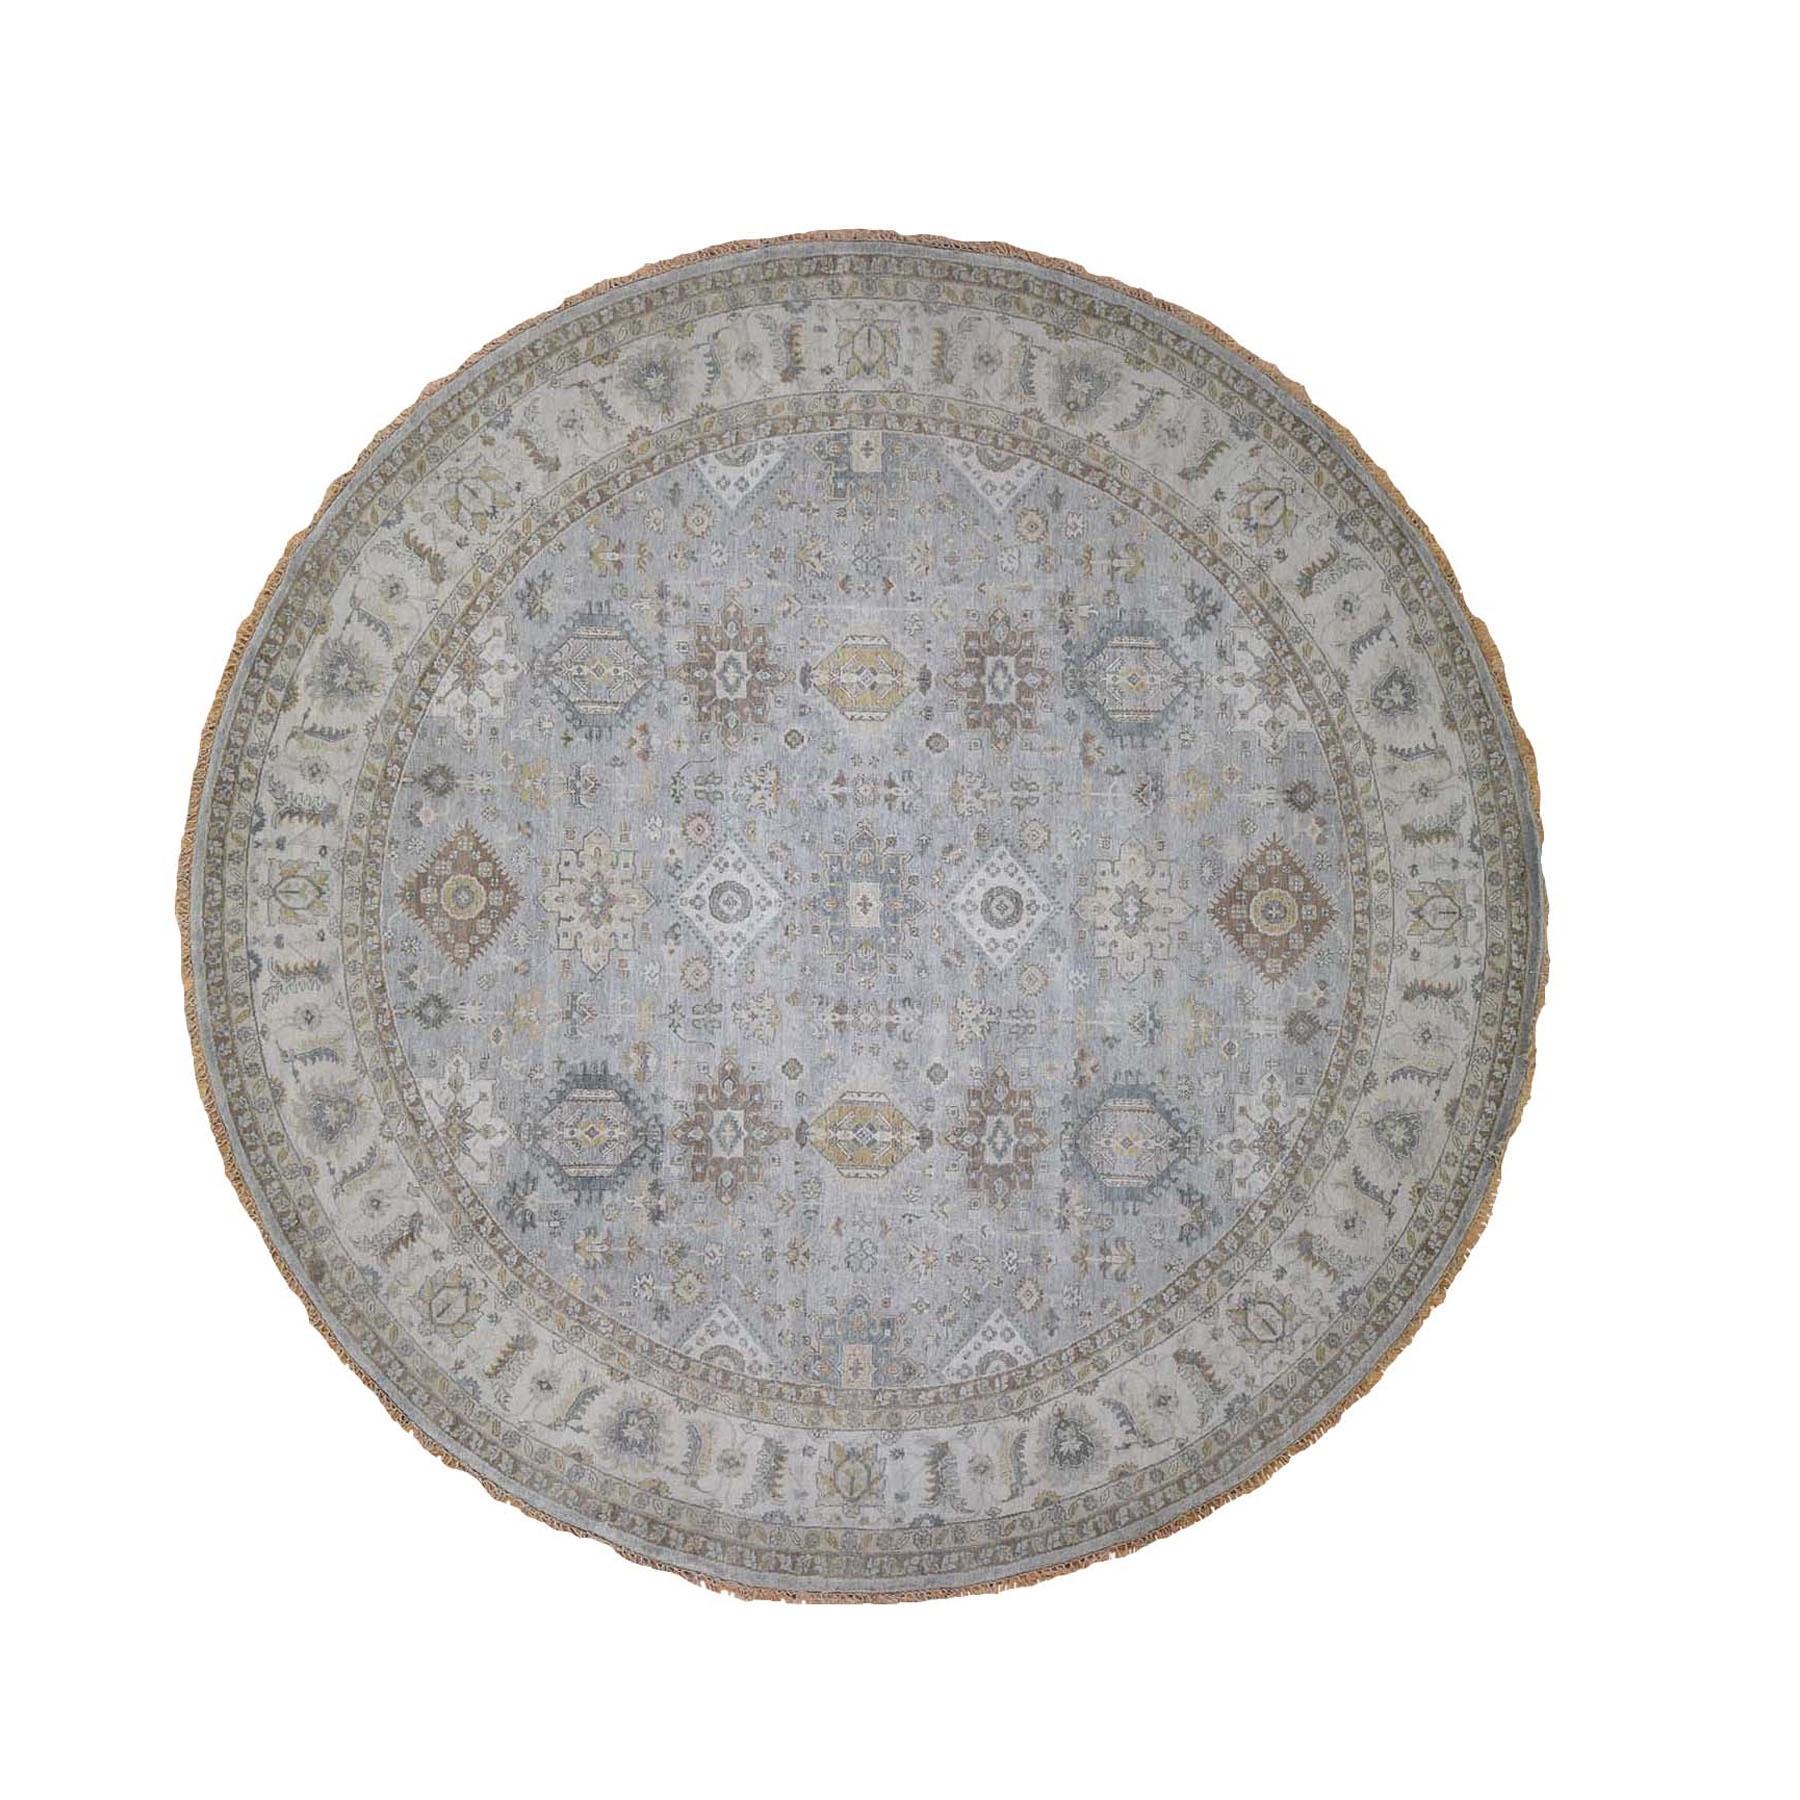 Serapi Heriz and Bakhshayesh Collection Hand Knotted Grey Rug No: 0197758